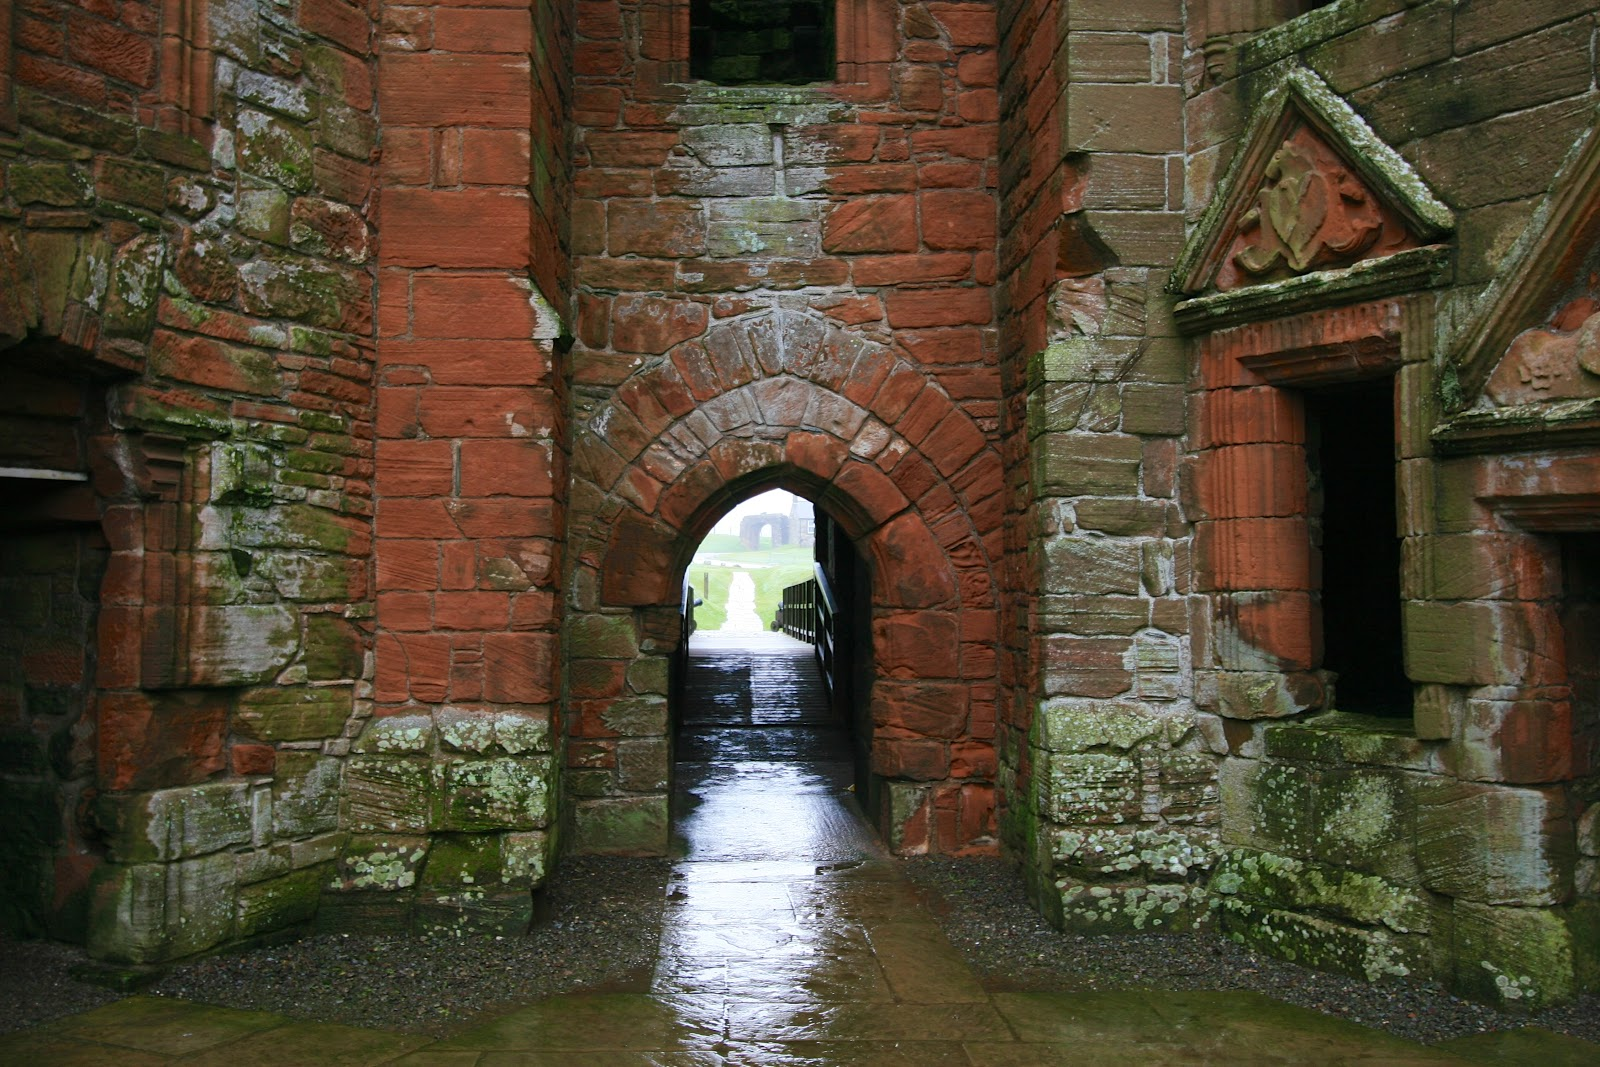 Abbey rain 1 - 2 part 9